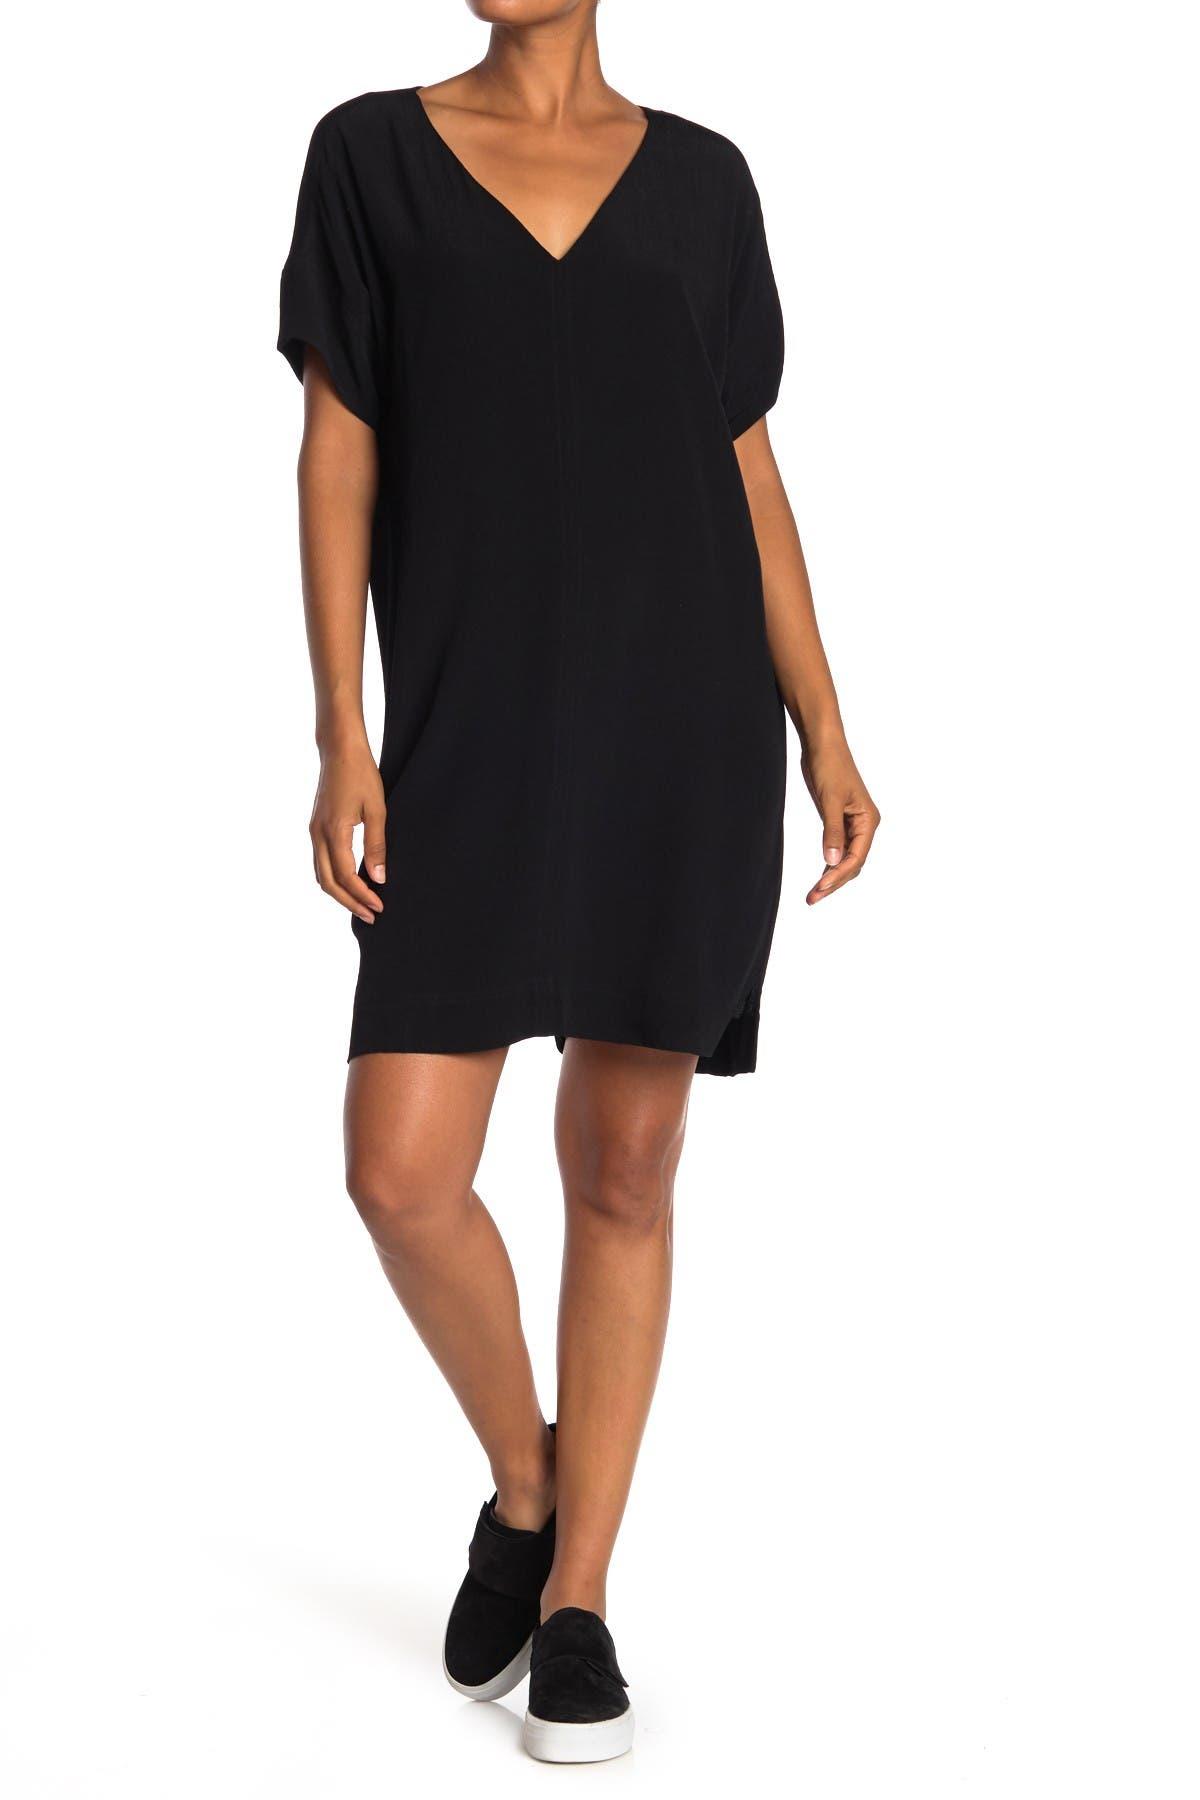 Image of Madewell Novel Shift Dress